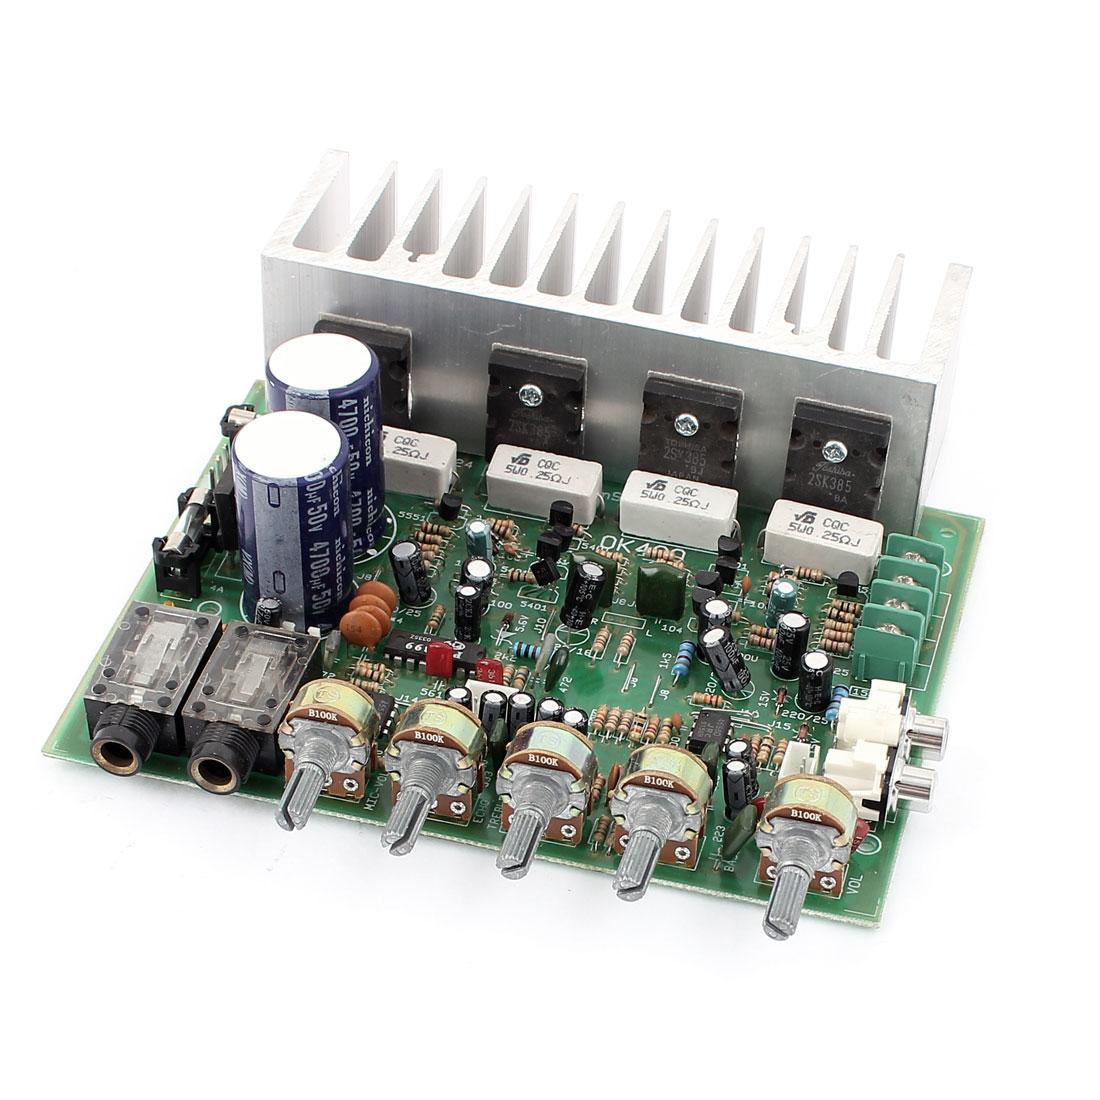 Unique Bargains  24V 250W+250W LFE Hi-Fi 4 Channel Audio Stereo Power Amplifier Board for Car